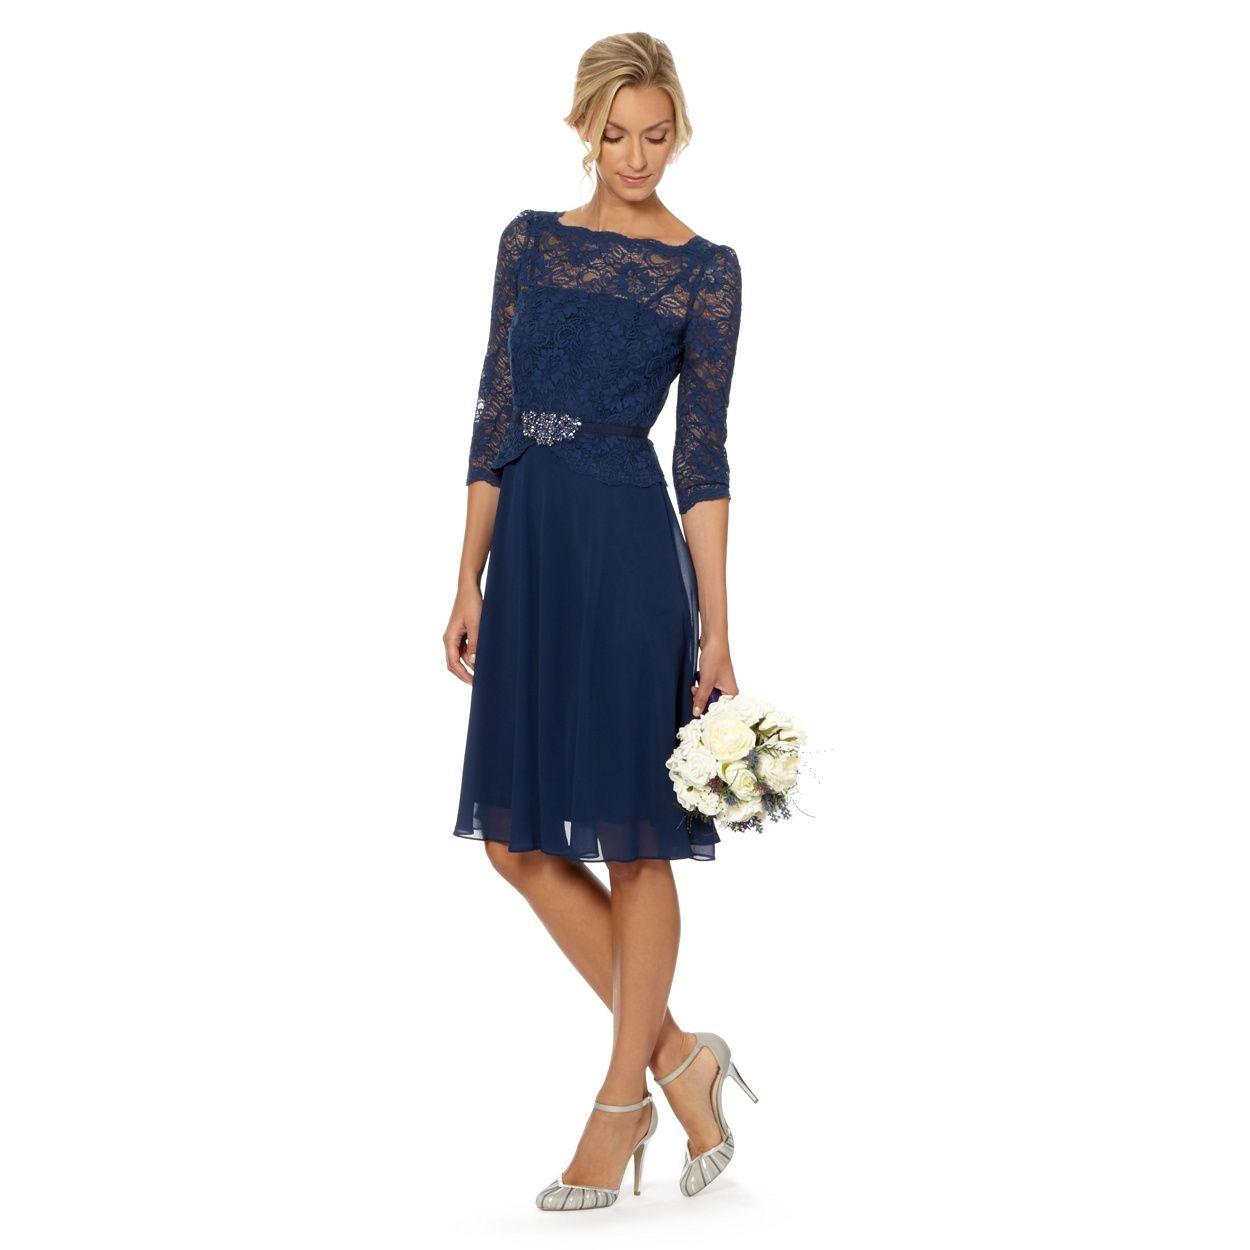 Pin by jennifer farrell on bridesmaid dresses pinterest 1 jenny packham designer mid blue lace bodice midi dress at debenhams ombrellifo Choice Image